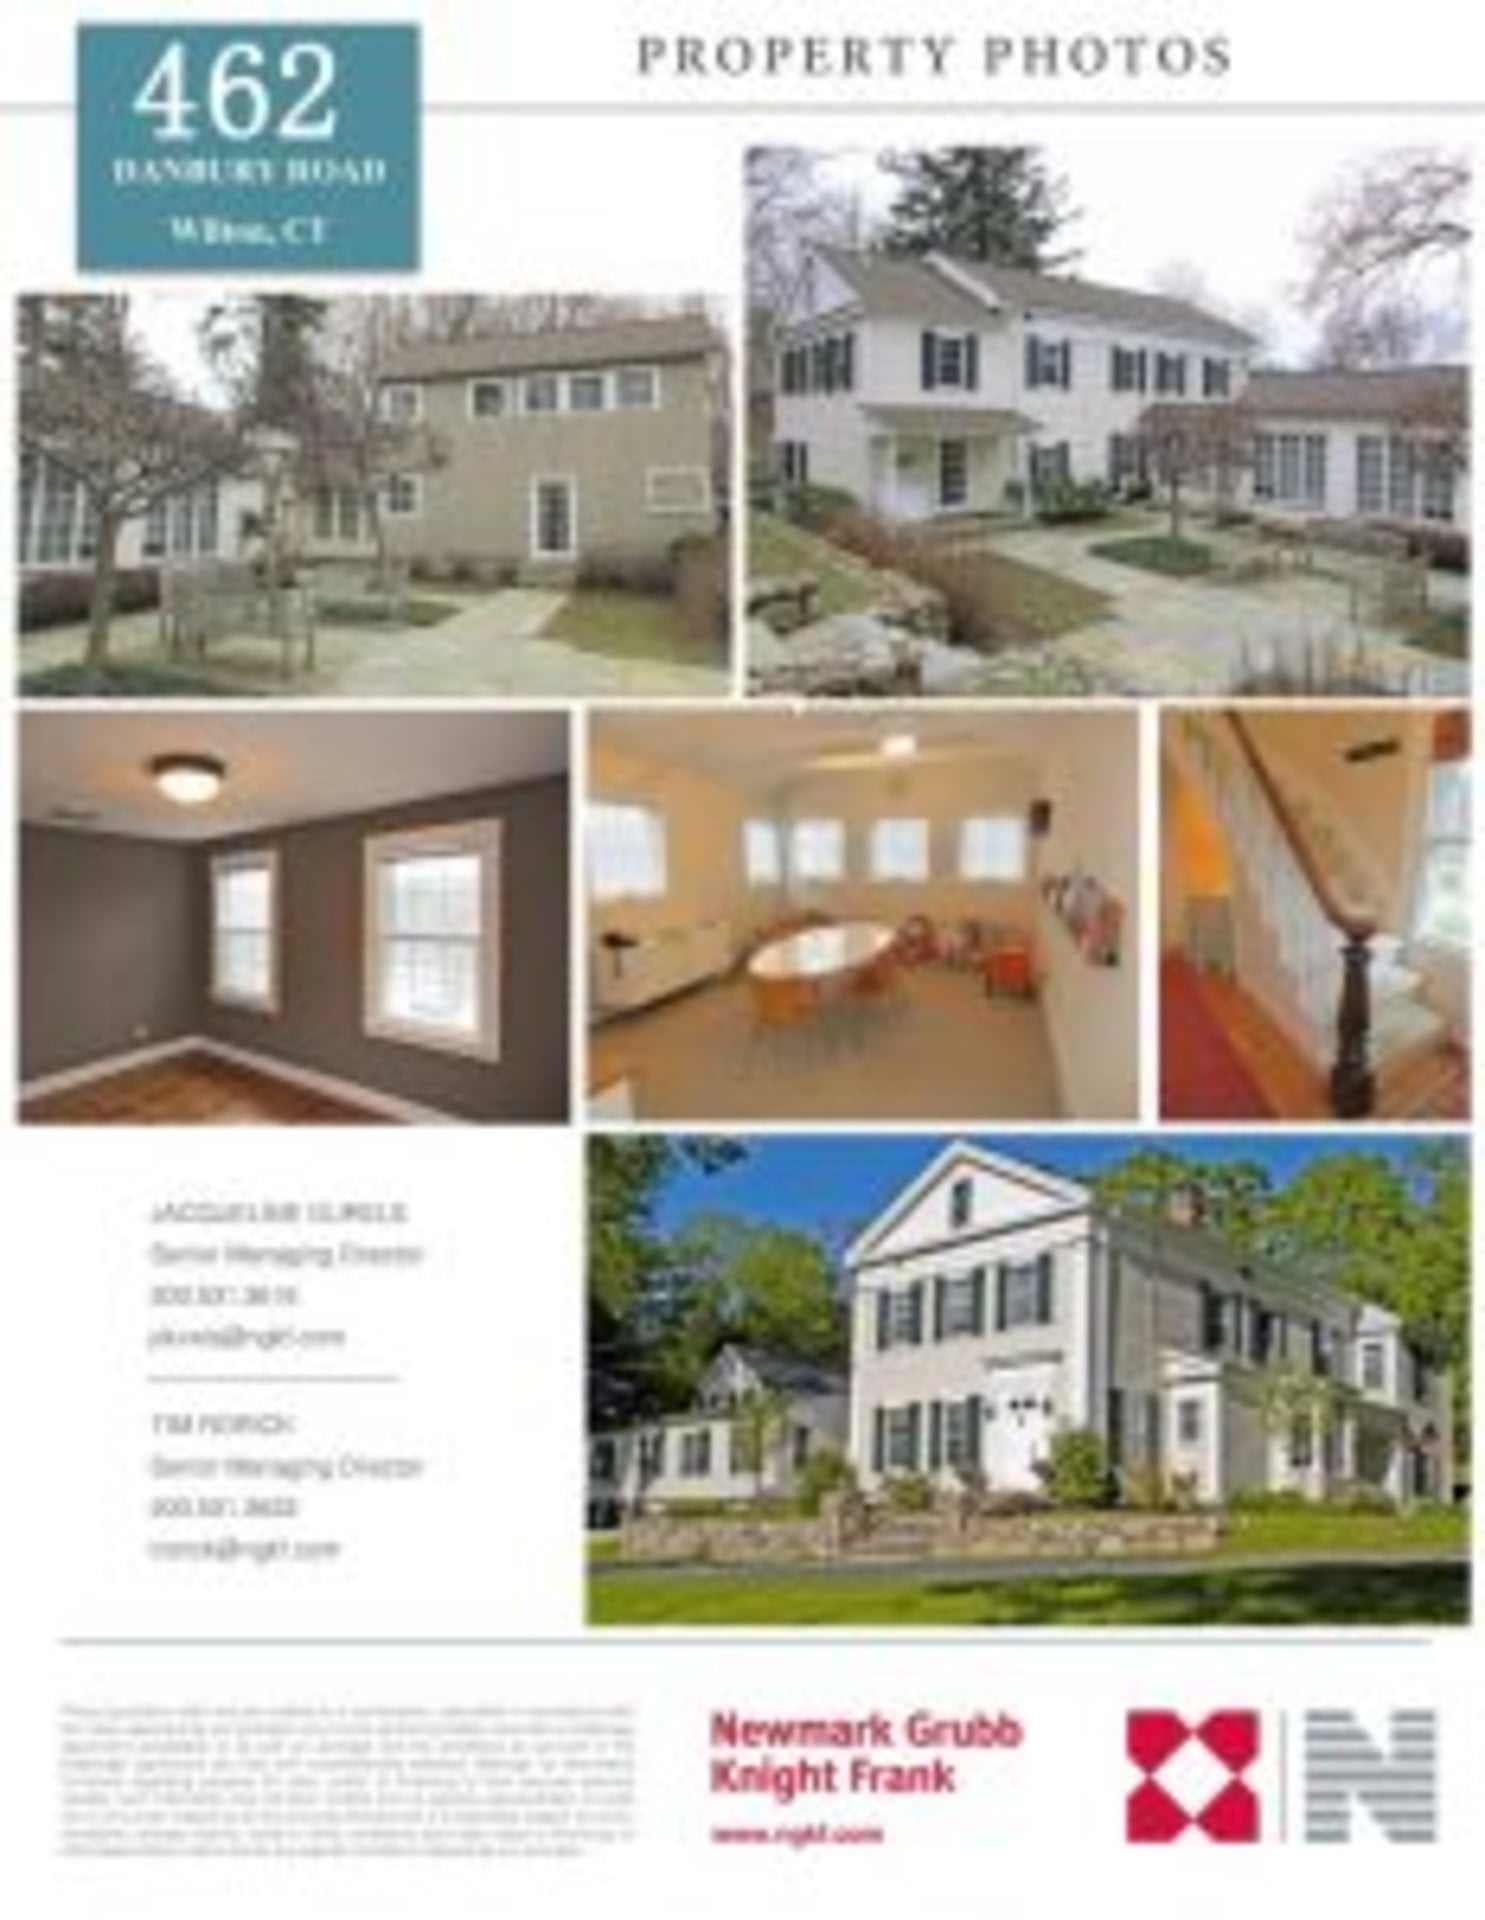 Property For Sale: 462 Danbury Road, Wilton, CT.